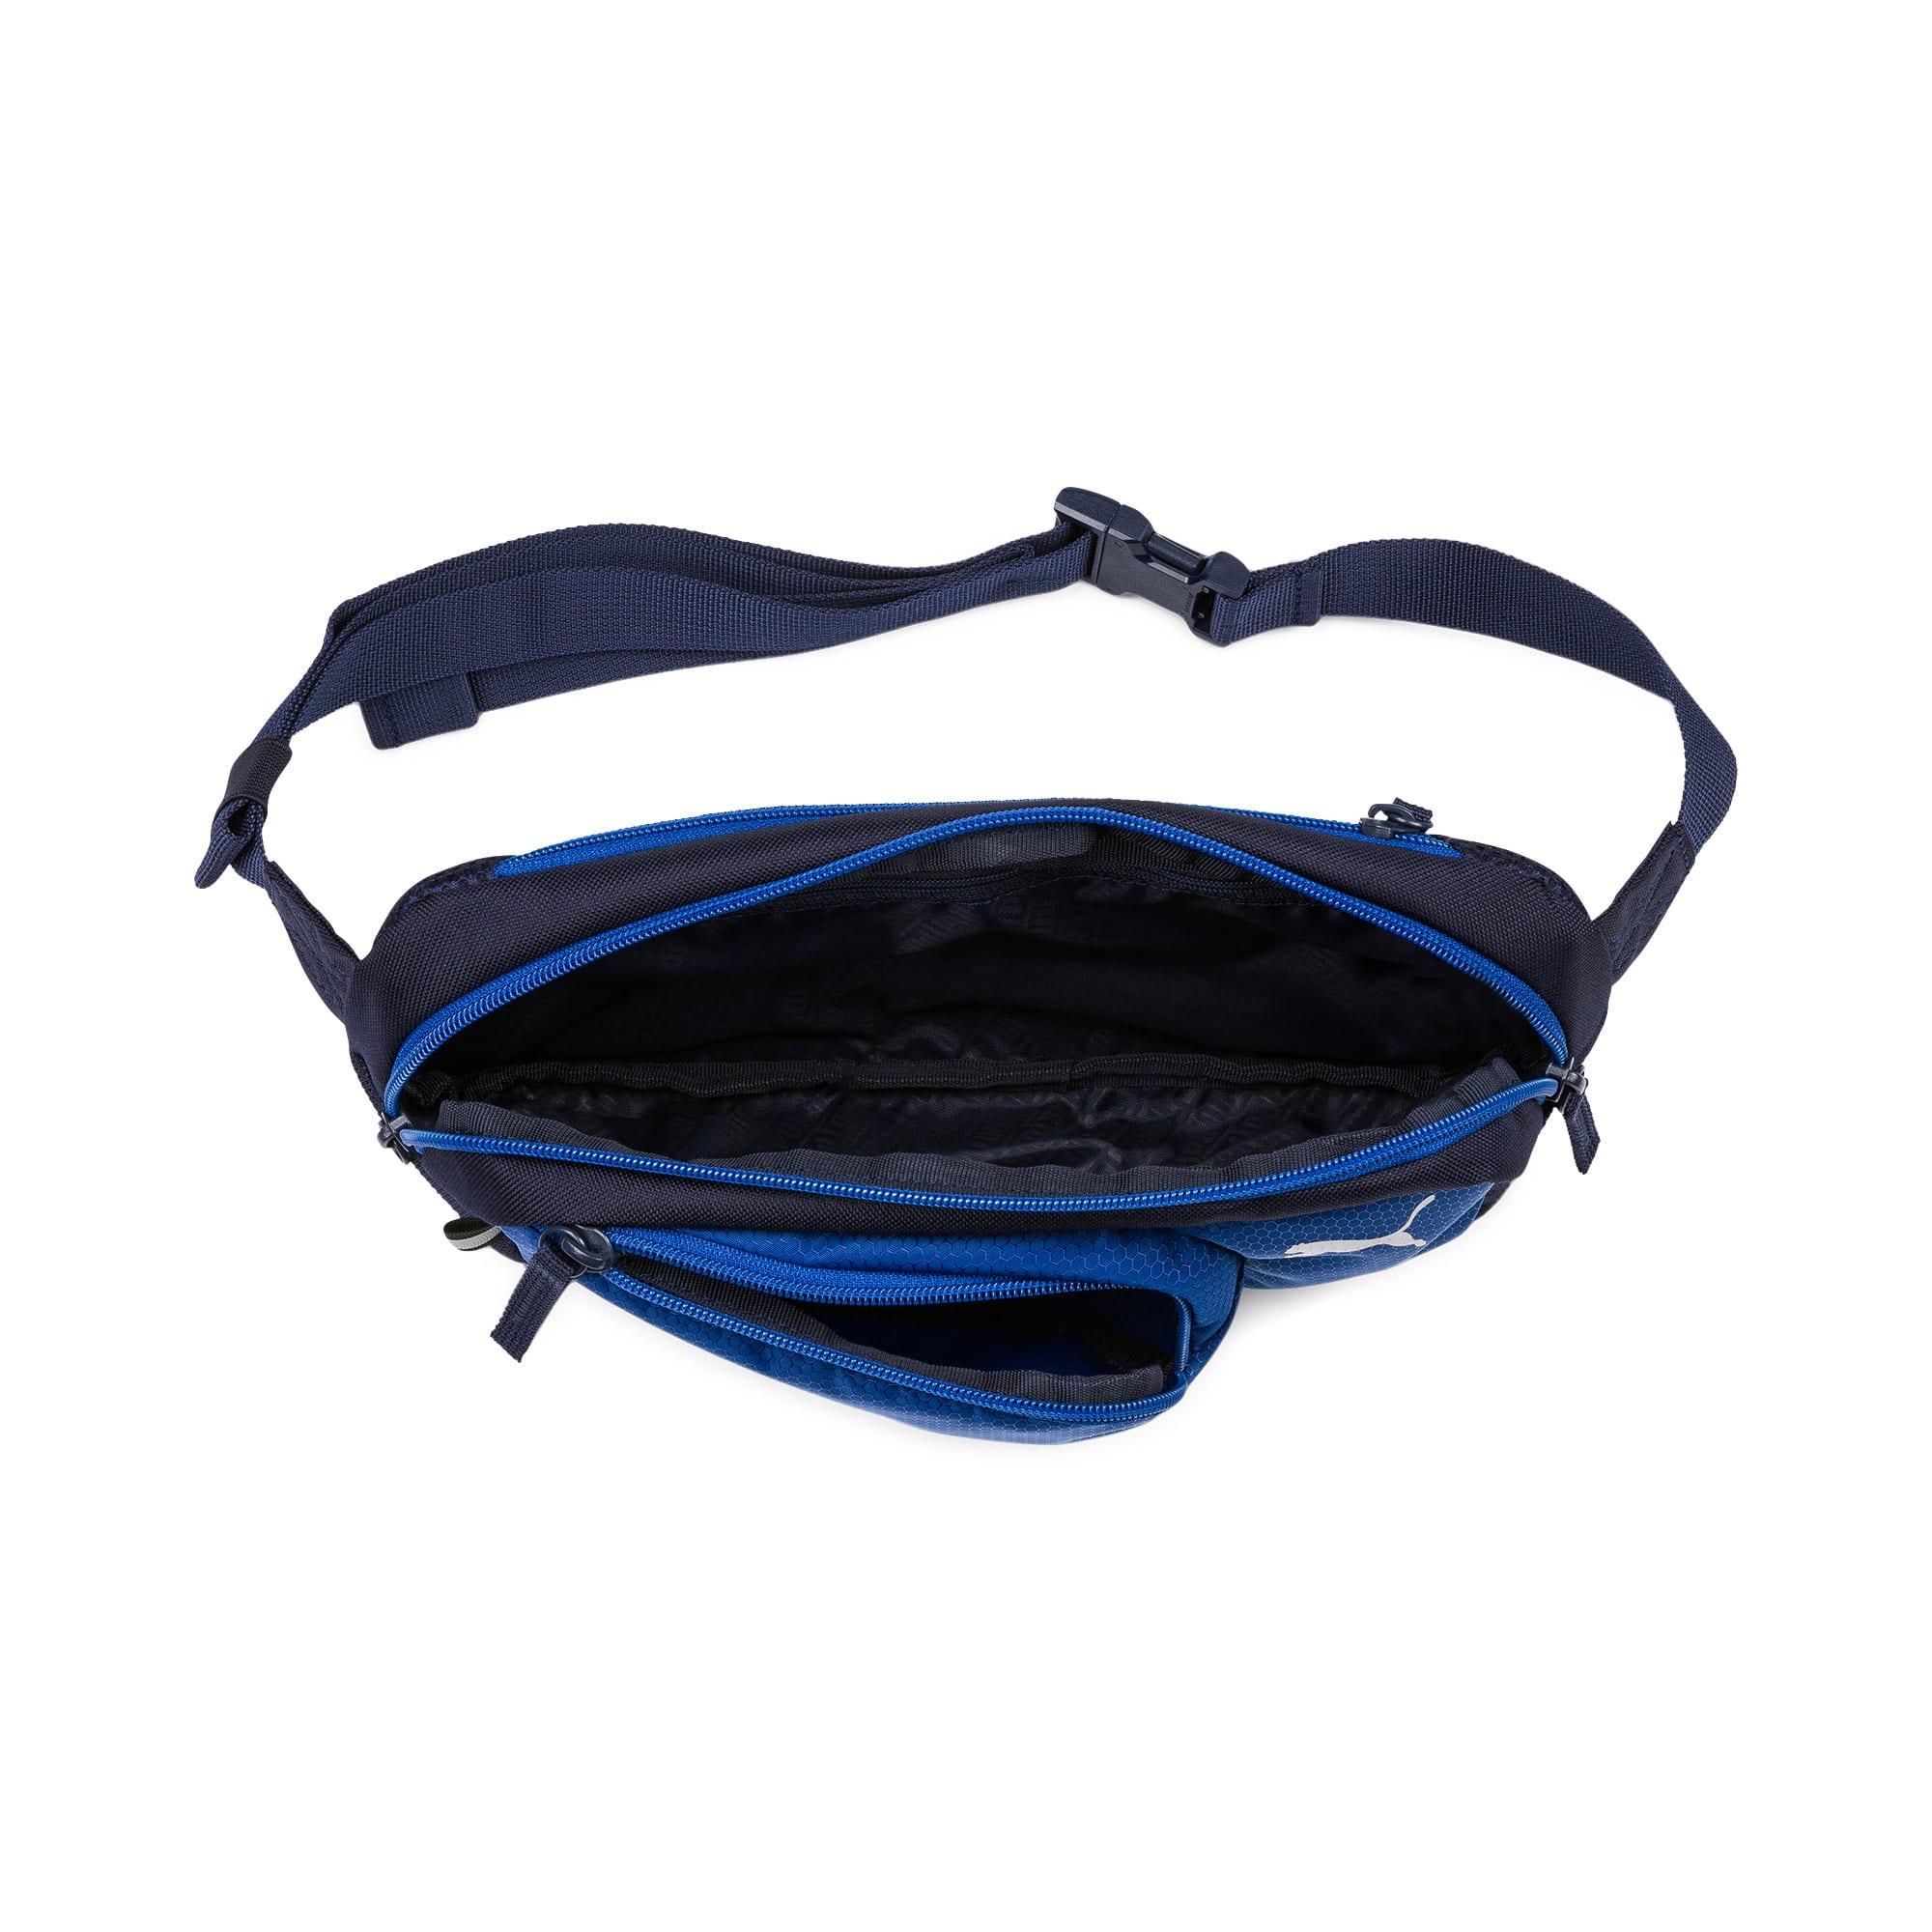 Miniatura 3 de Bolso pequeño para cintura PUMA X Multi, Peacoat-Galaxy Blue, mediano